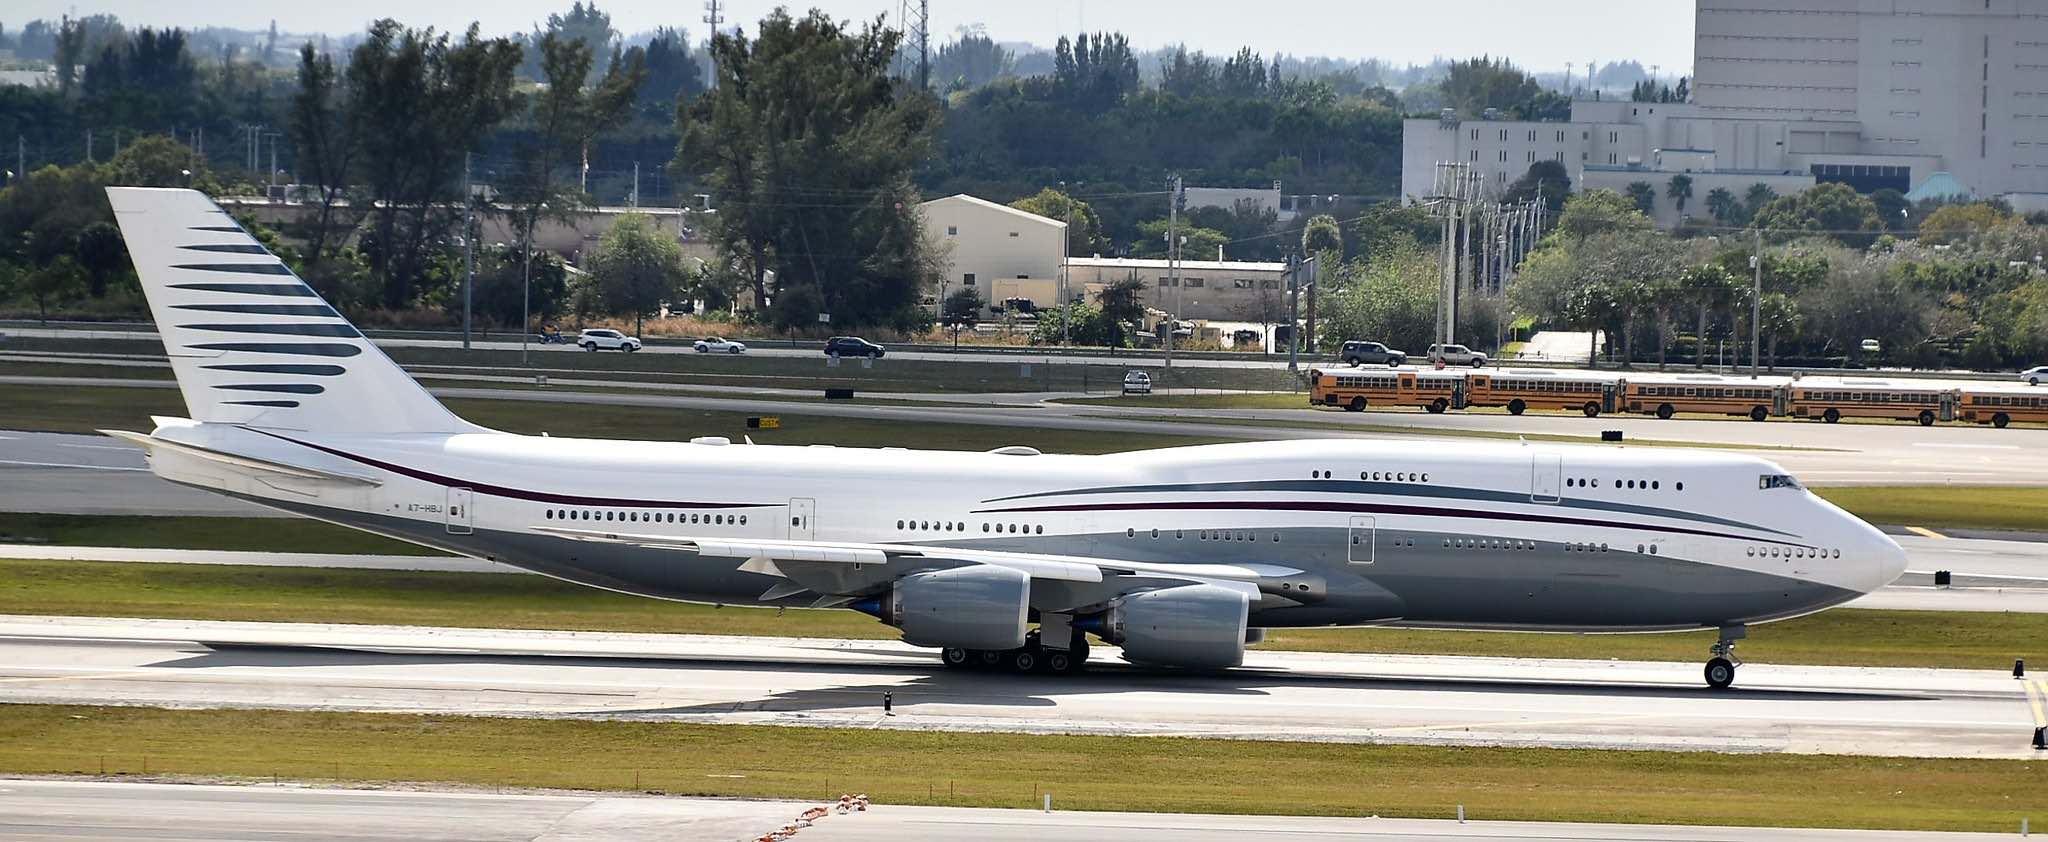 Jet privado Boeing 747-8i